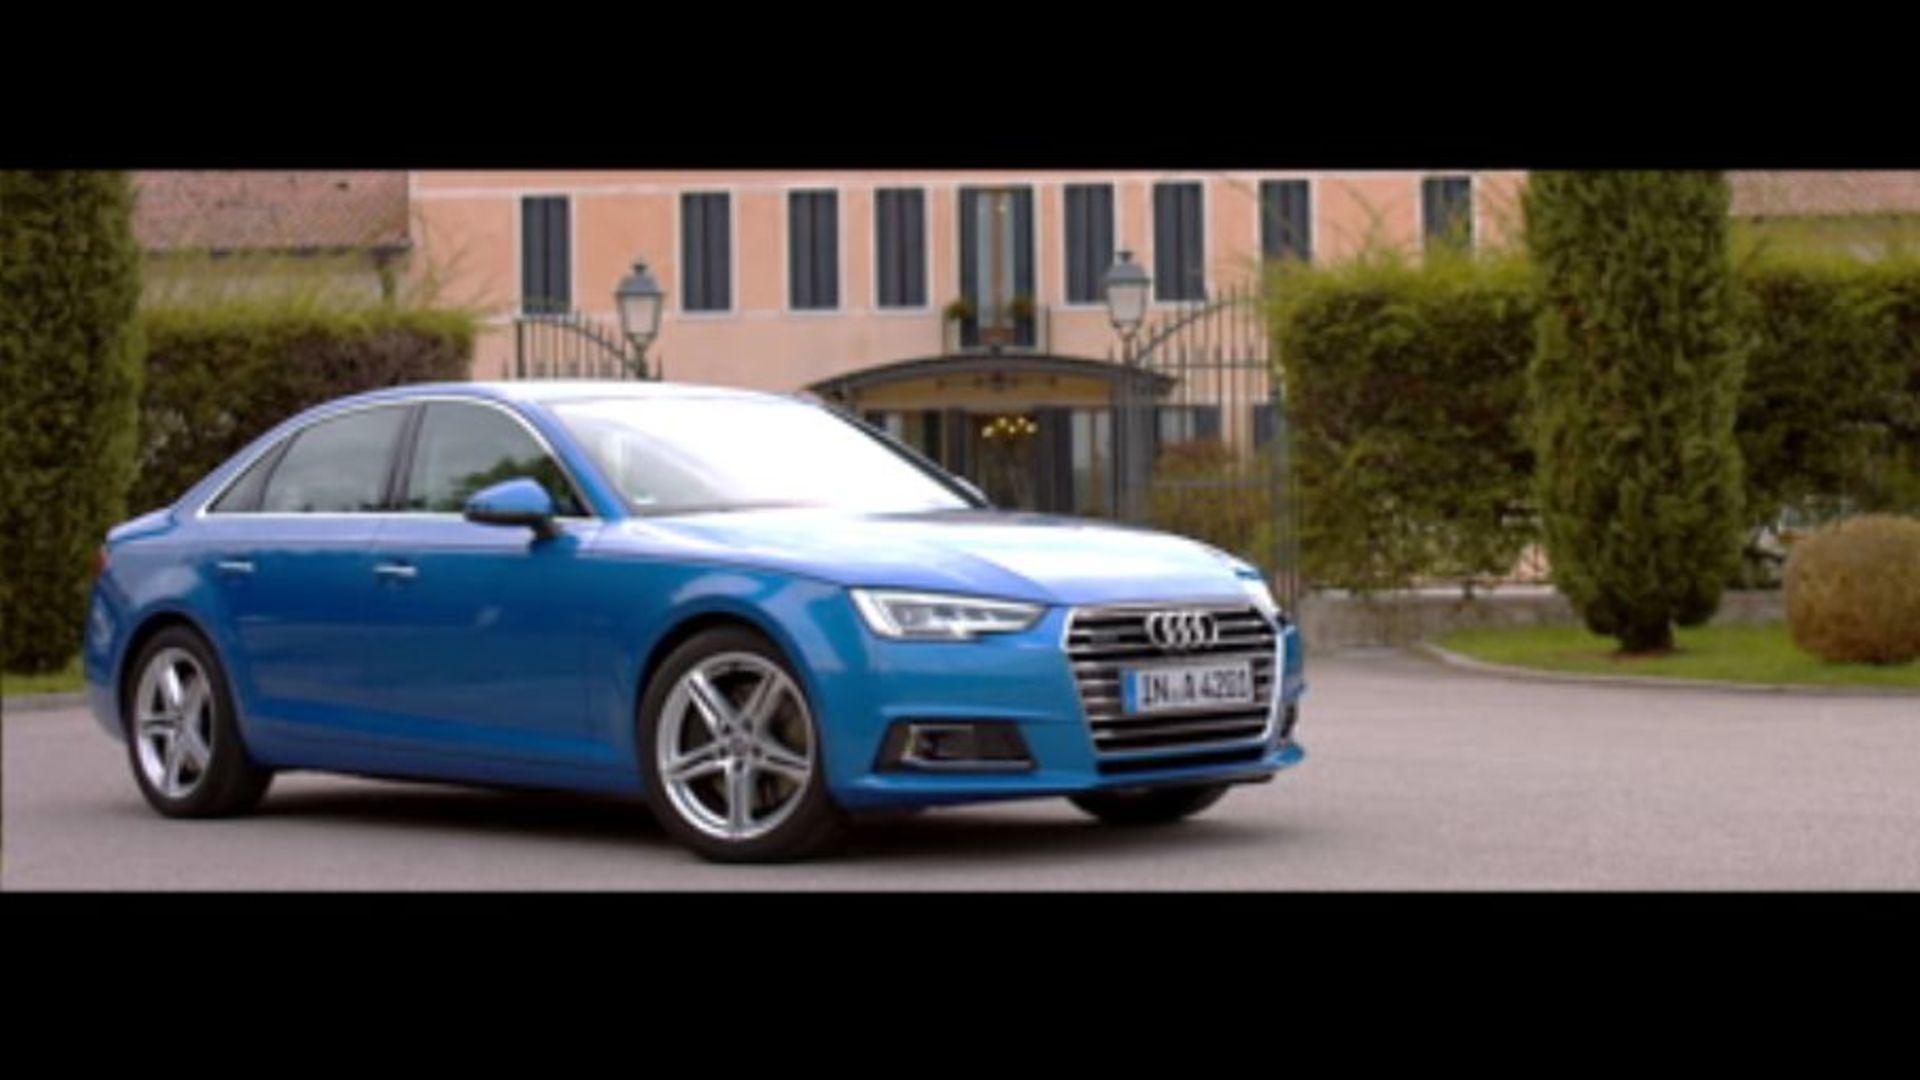 Audi A4 (2015) - Trailer Venedig